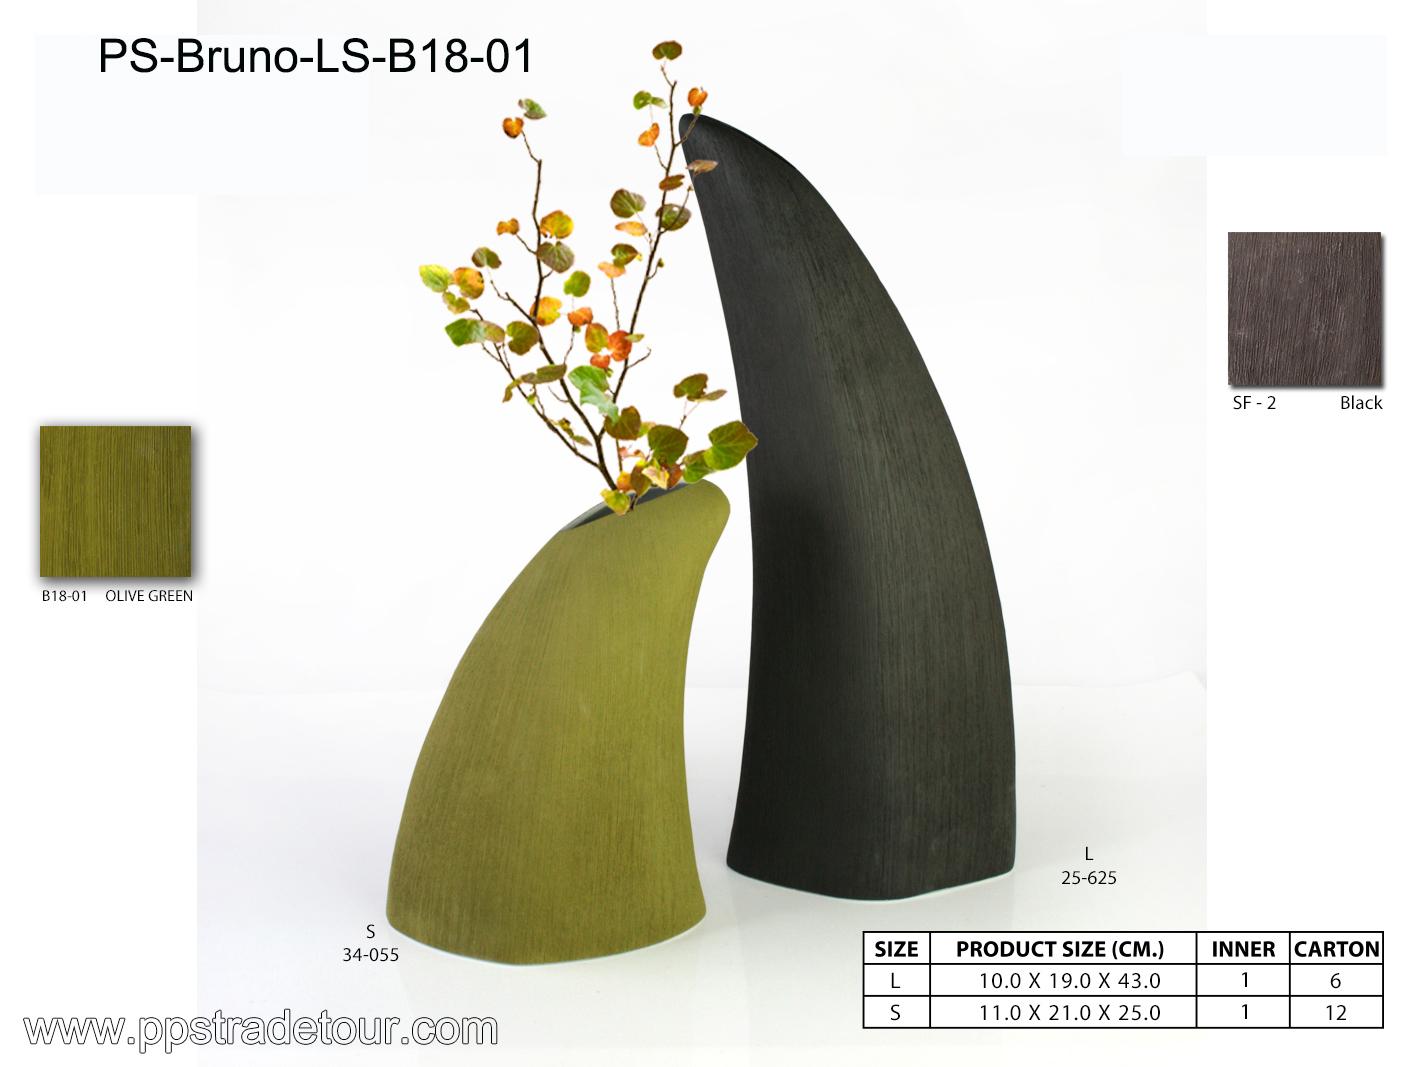 PSCV-Bruno-LS-B18-01-OLIVE-GREENSF-2